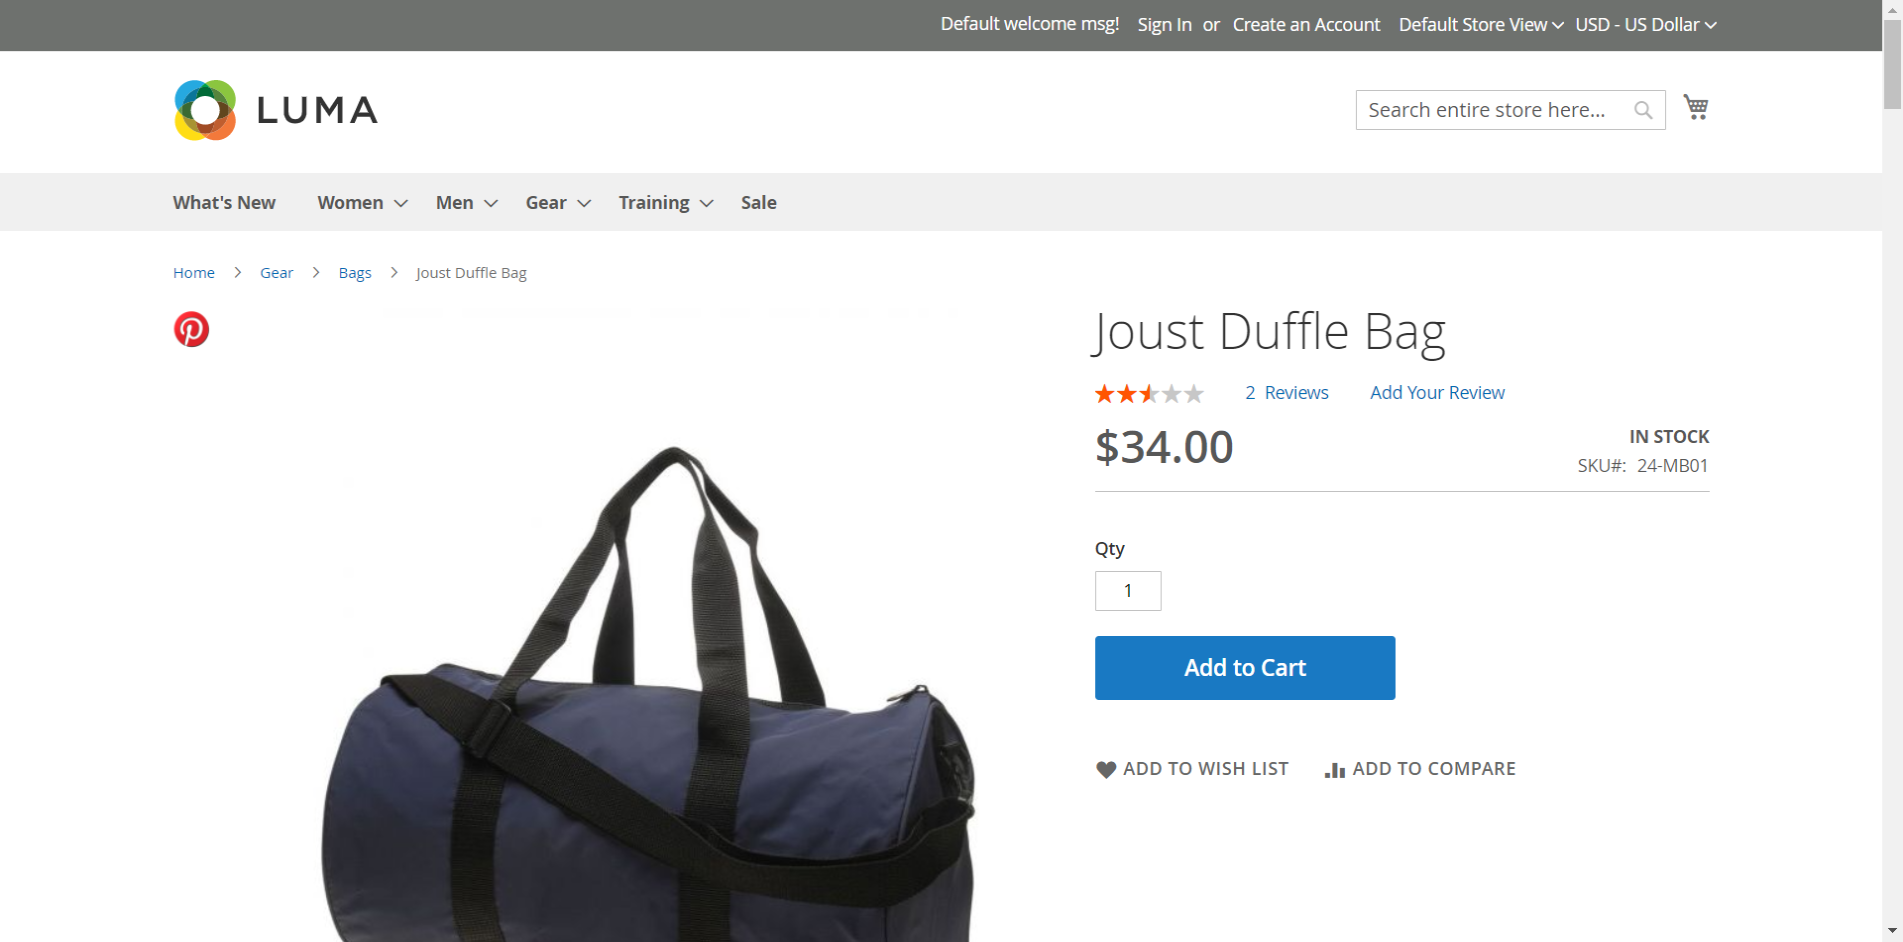 Joust-Duffle-Bag